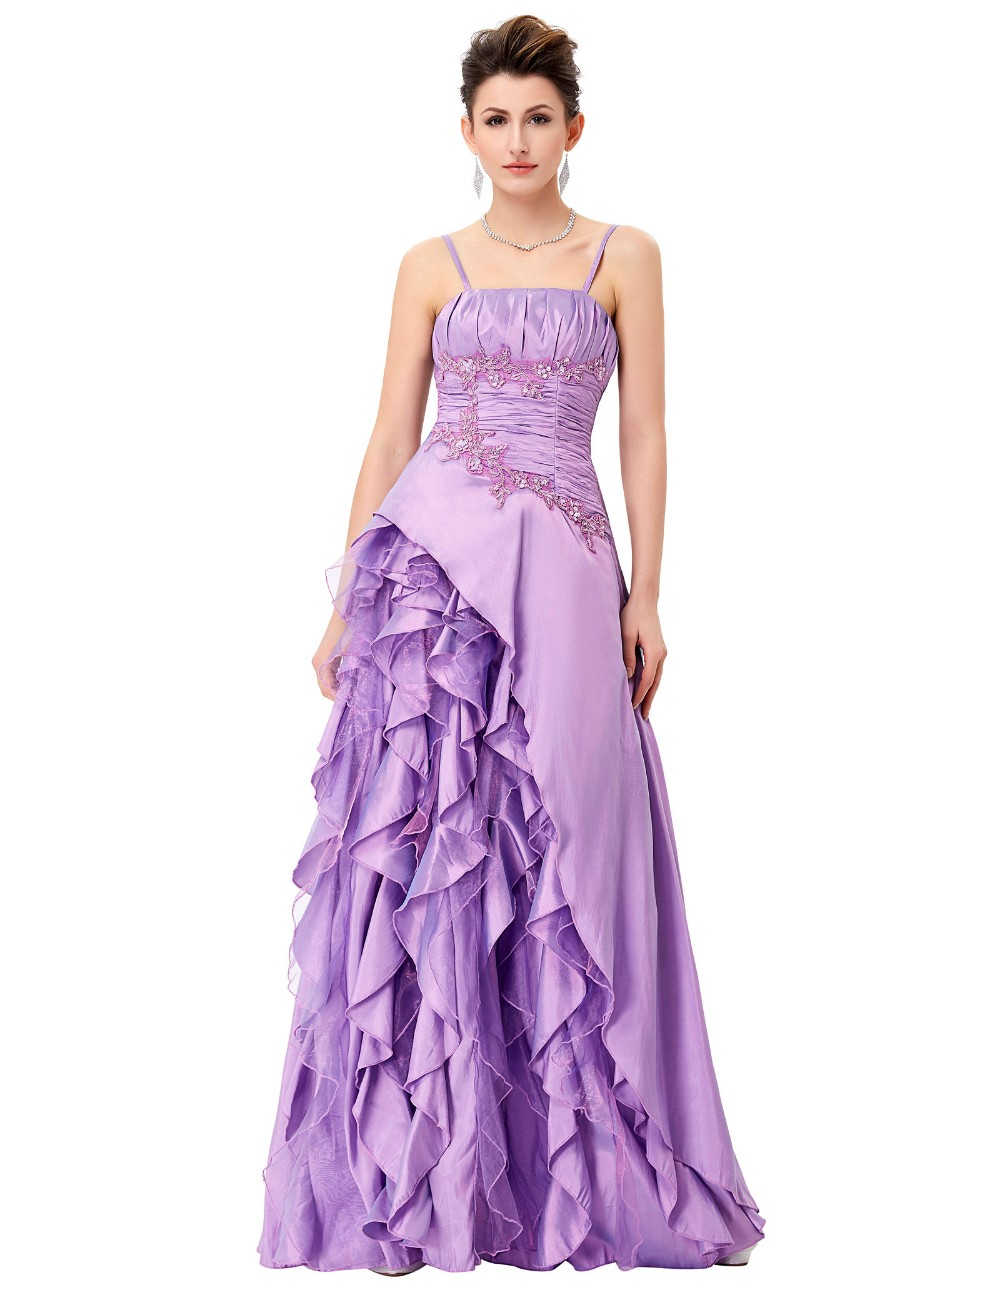 ₪Gracia Karin púrpura vestido de noche largo Banquete de novia ...